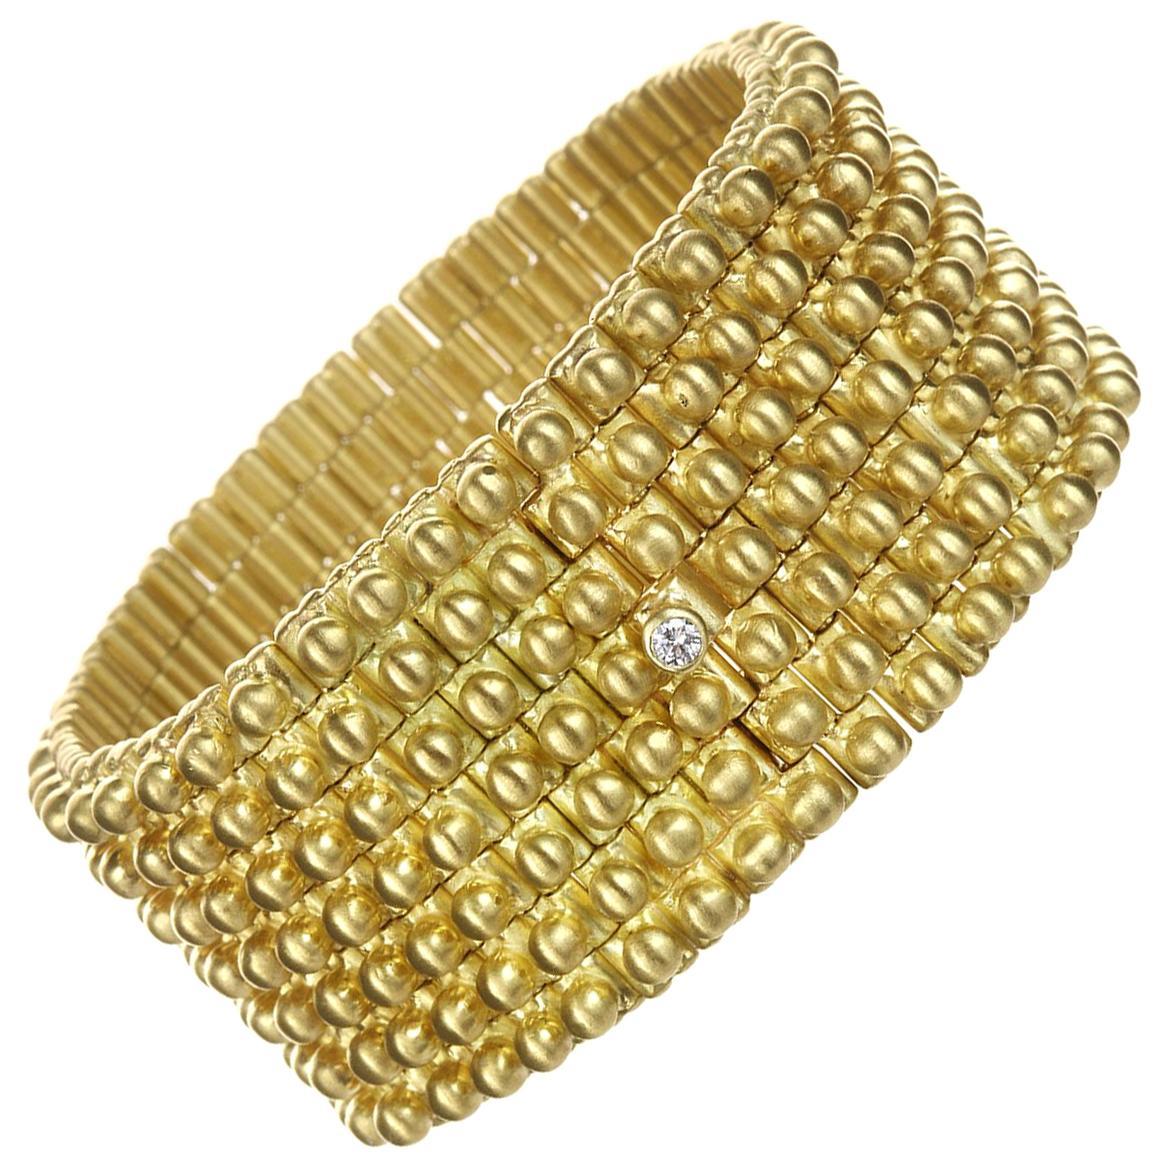 Faye Kim 18 Karat Gold Handmade Flexible Link Cuff Bracelet with Diamond Closure